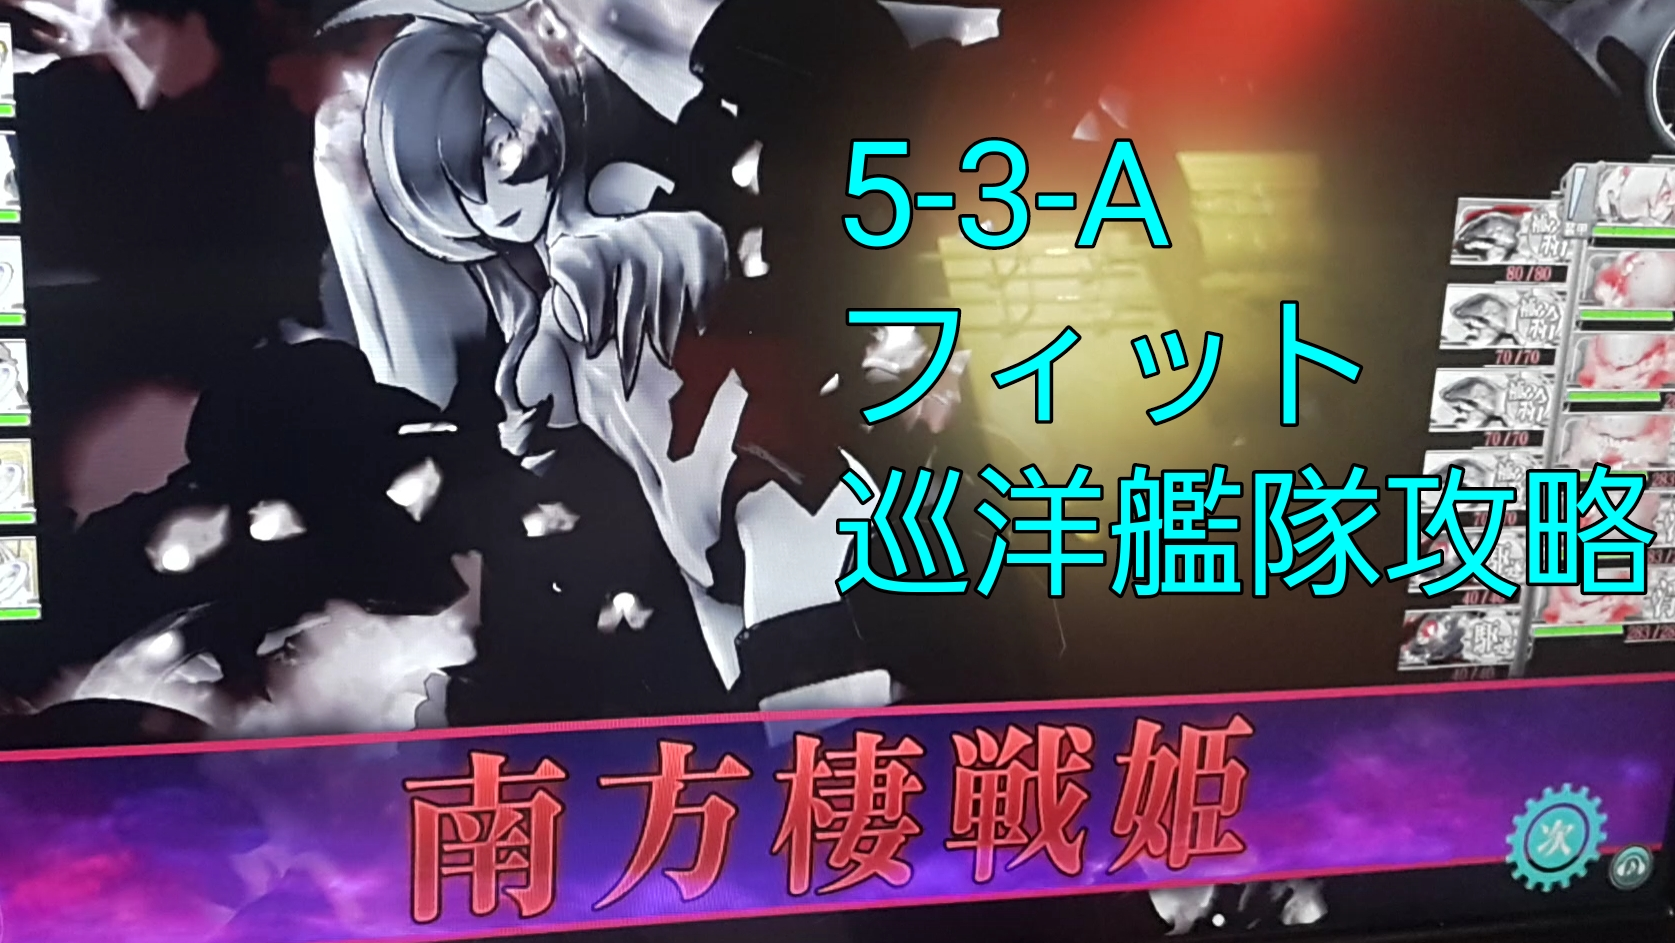 【AC】第一次サーモン沖海戦(5-3-A) 駆逐1雷巡3航巡2 プレイ動画